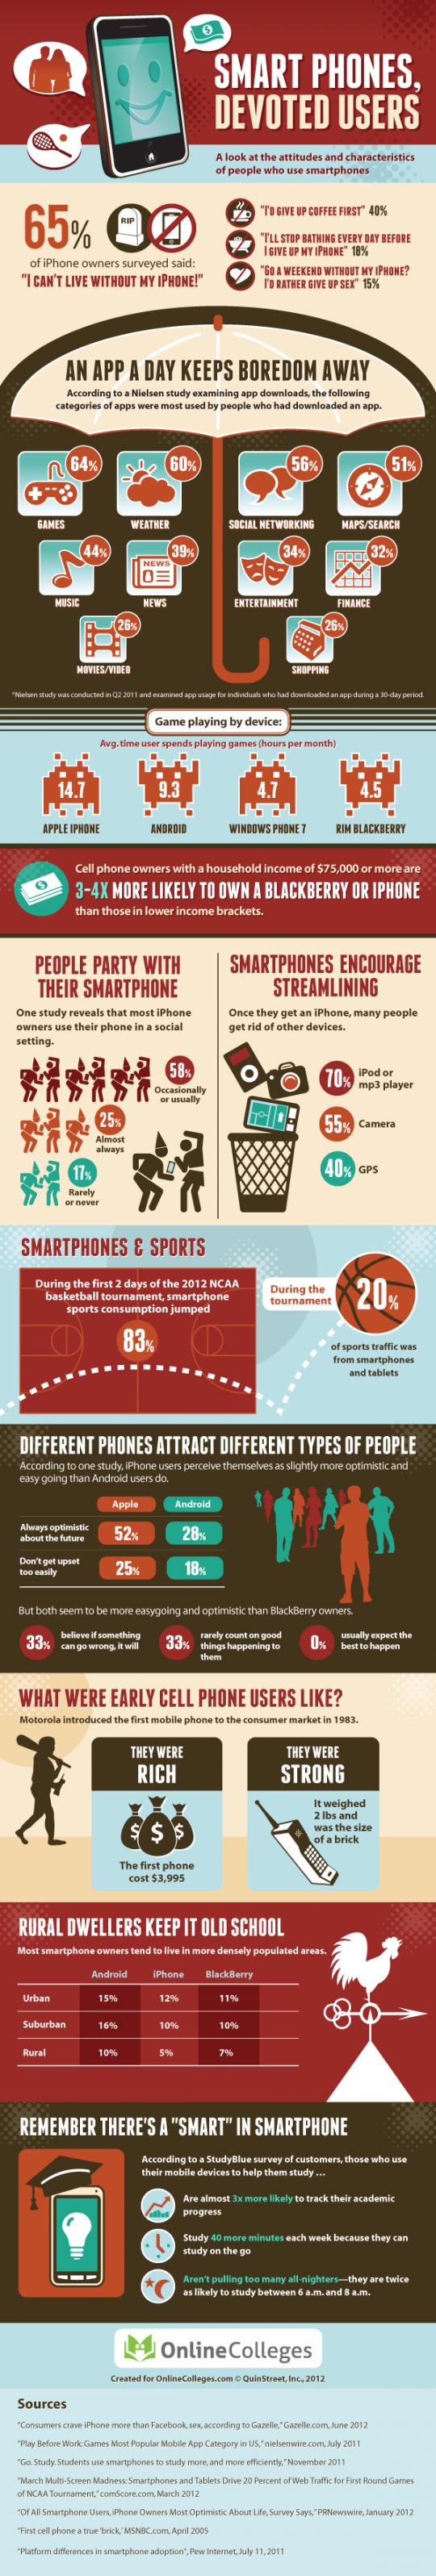 15-09-12 smartphone-devoted-users